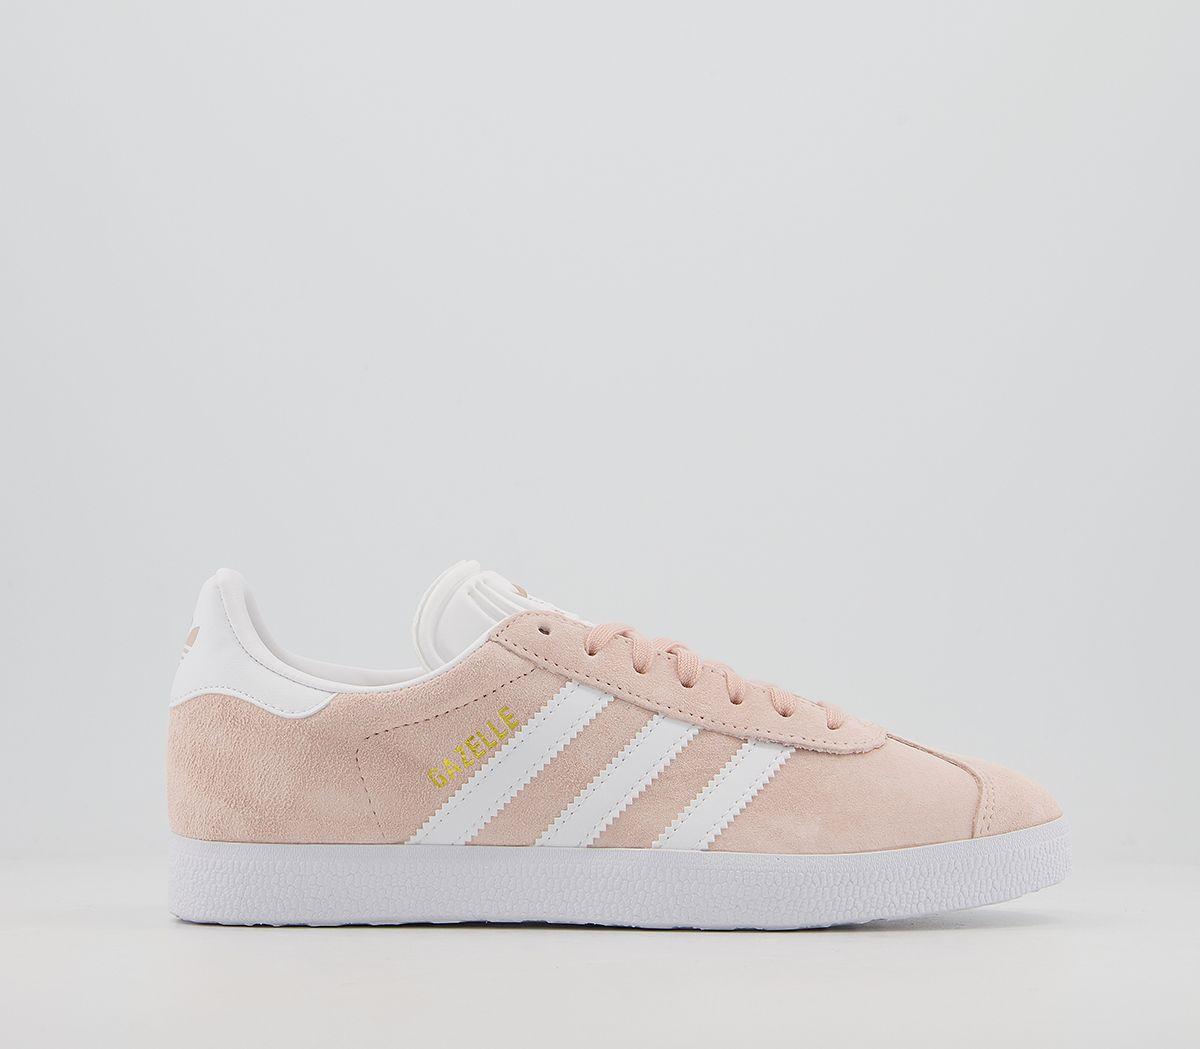 Adidas-Gazelle-Vapour-Pink-White-Trainers-Shoes thumbnail 4